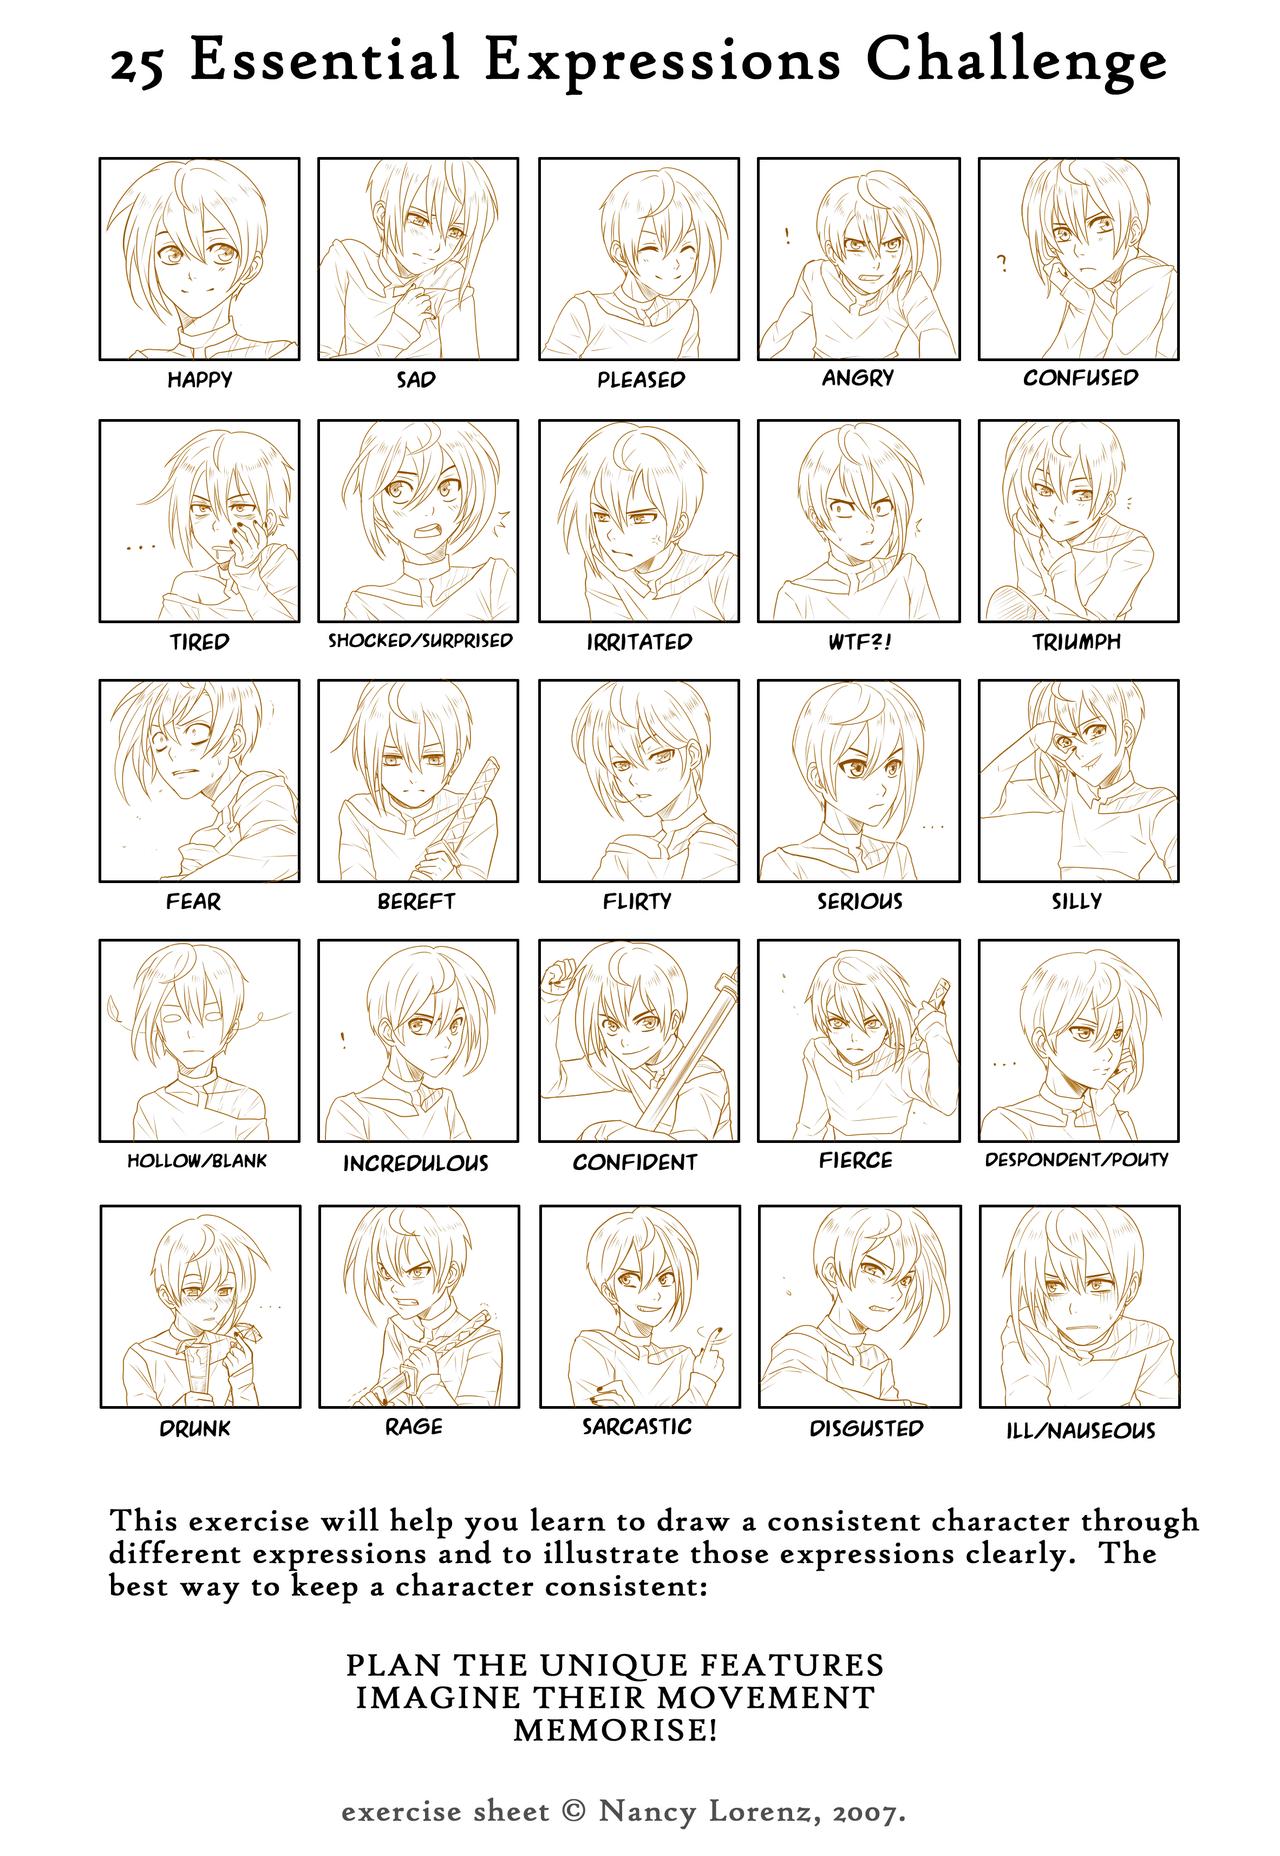 25 Essential Expressions Meme By Go Devil Daisukeviantart On Deviantart